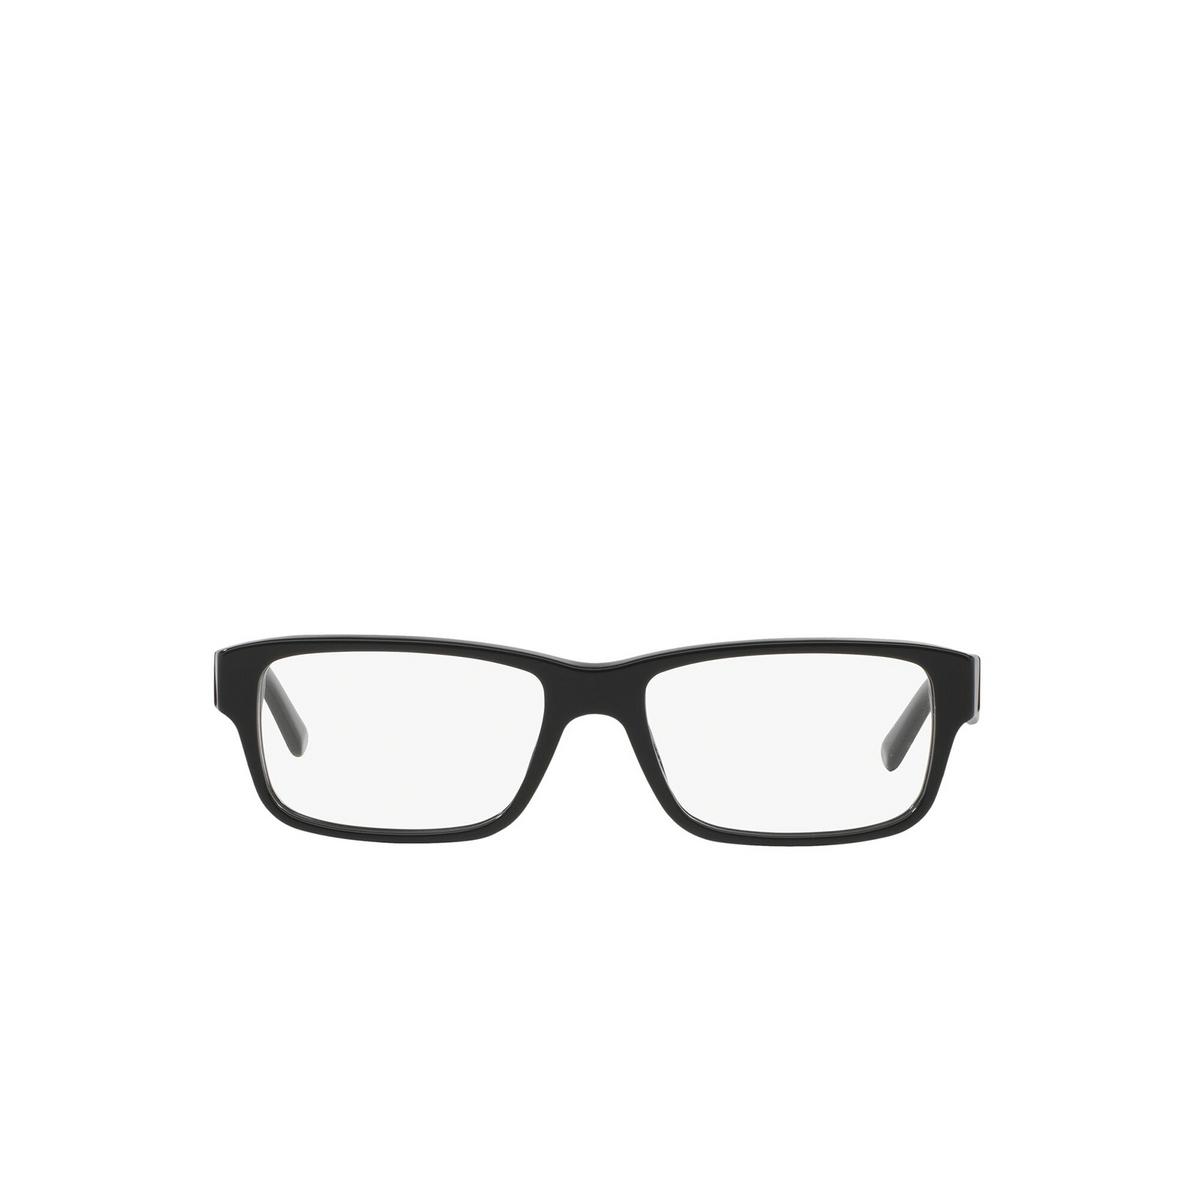 Prada® Rectangle Eyeglasses: Heritage PR 16MV color Gloss Black 1AB1O1 - front view.